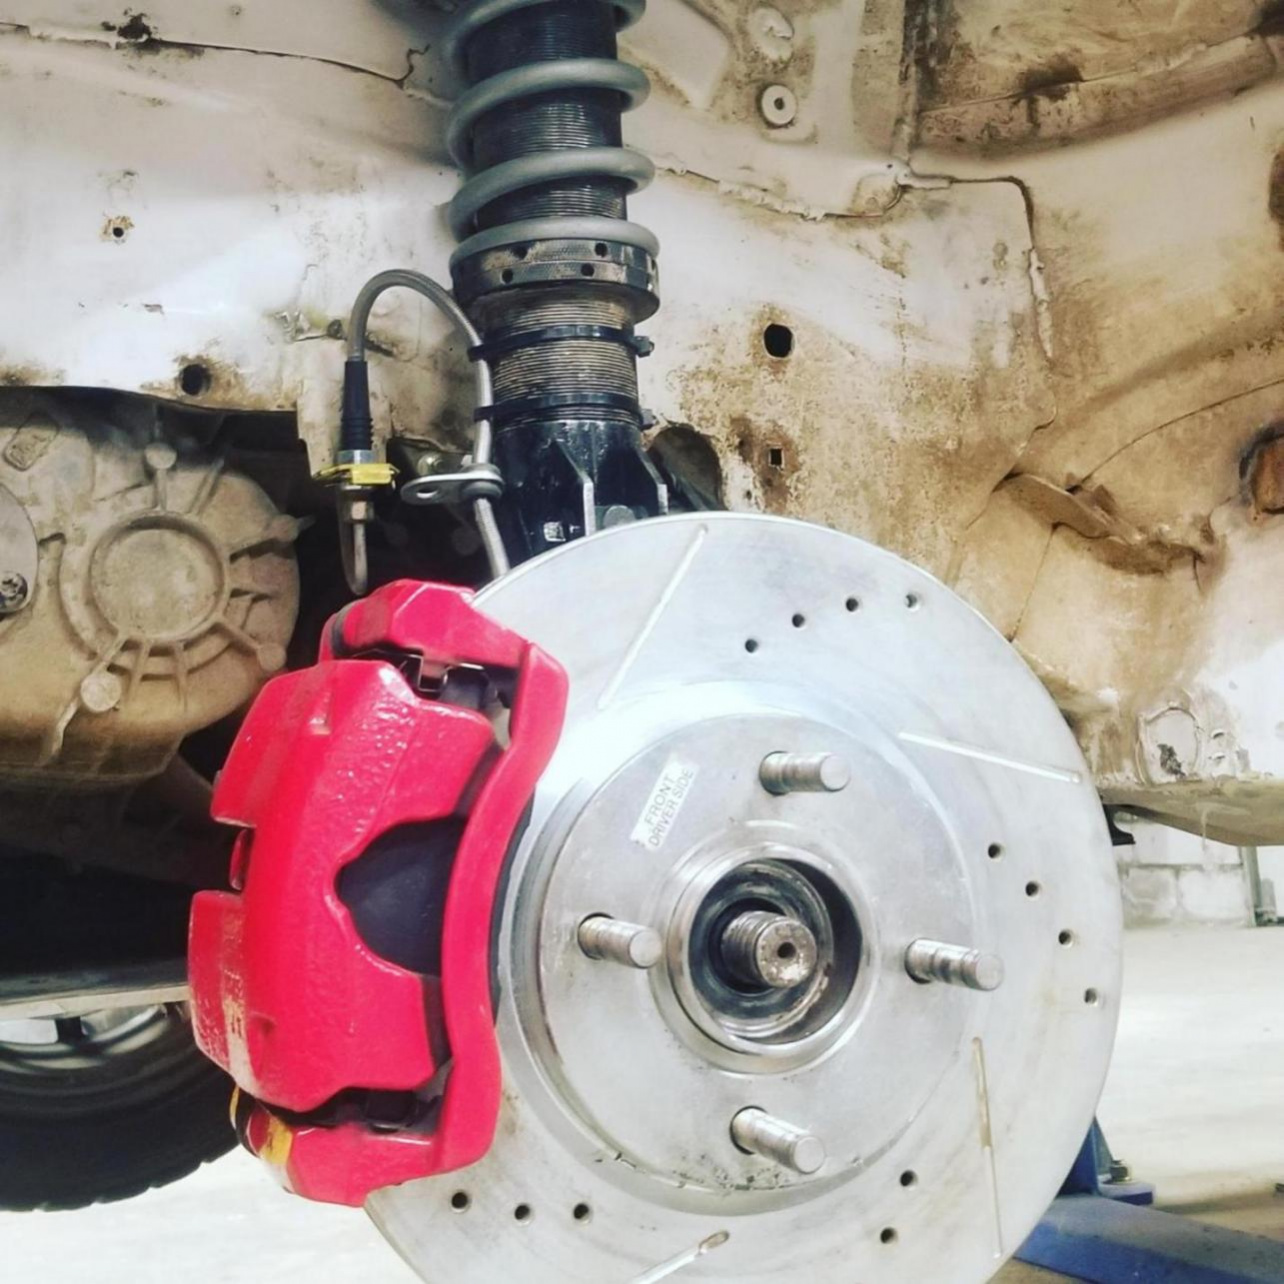 Fiesta Front Knuckles??? 2 bolt options-img_20190201_122830_751_1558891998261.jpg